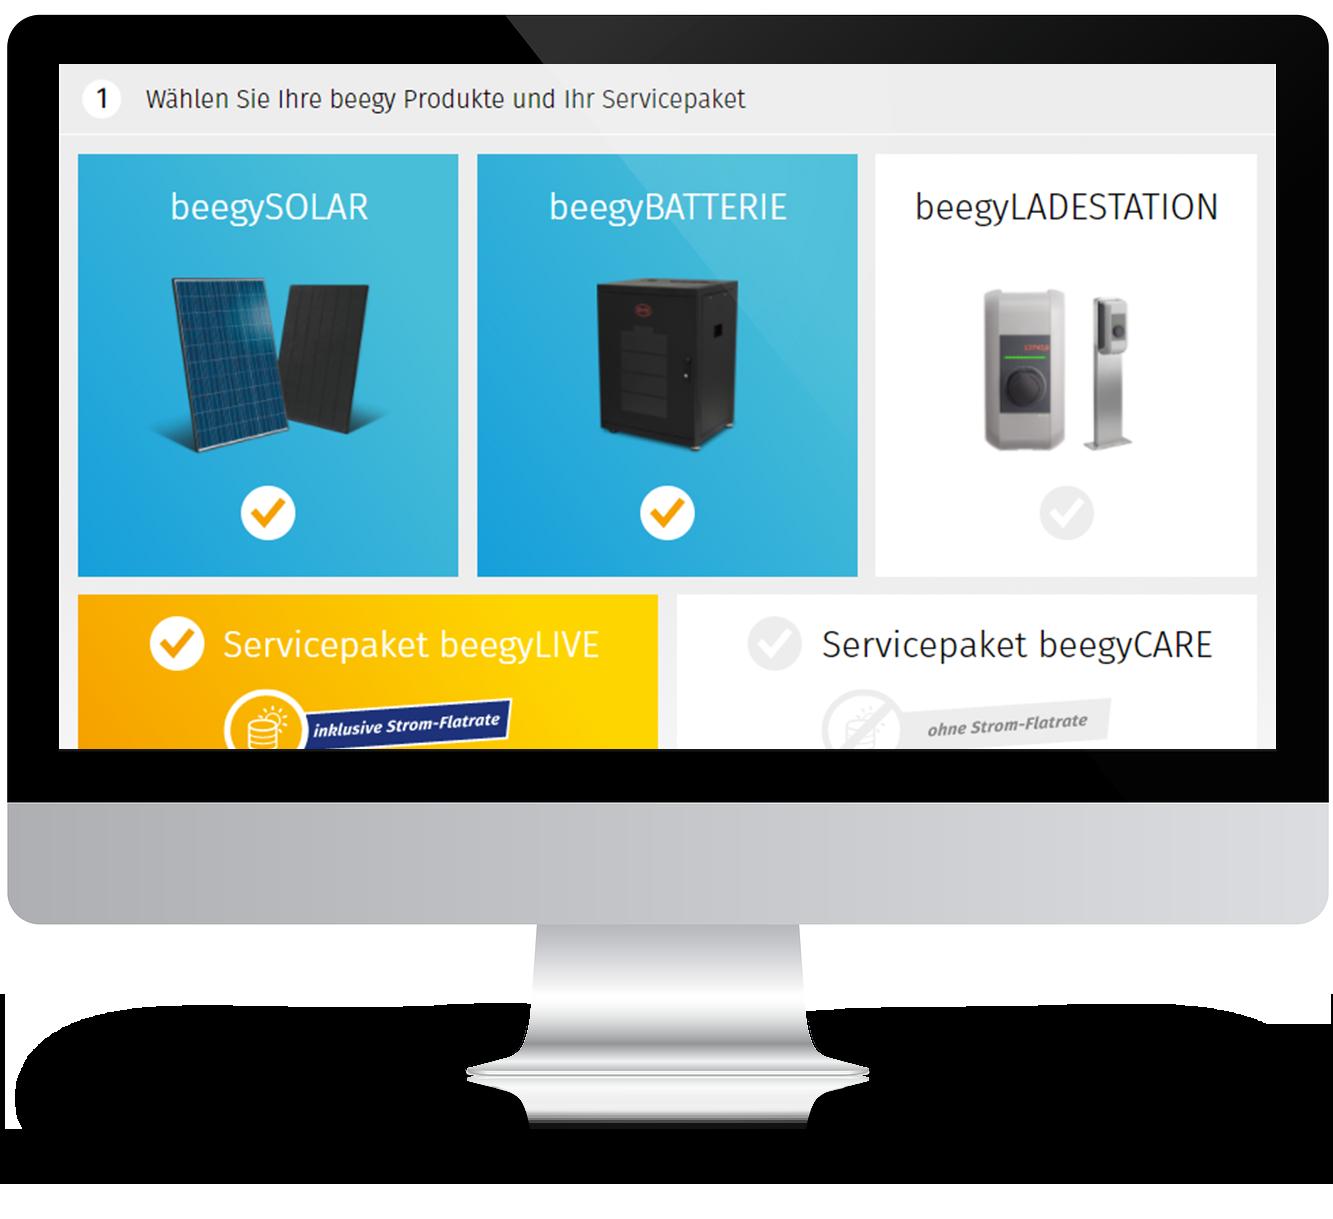 Leadgenerierung per Onlinekonfigurator